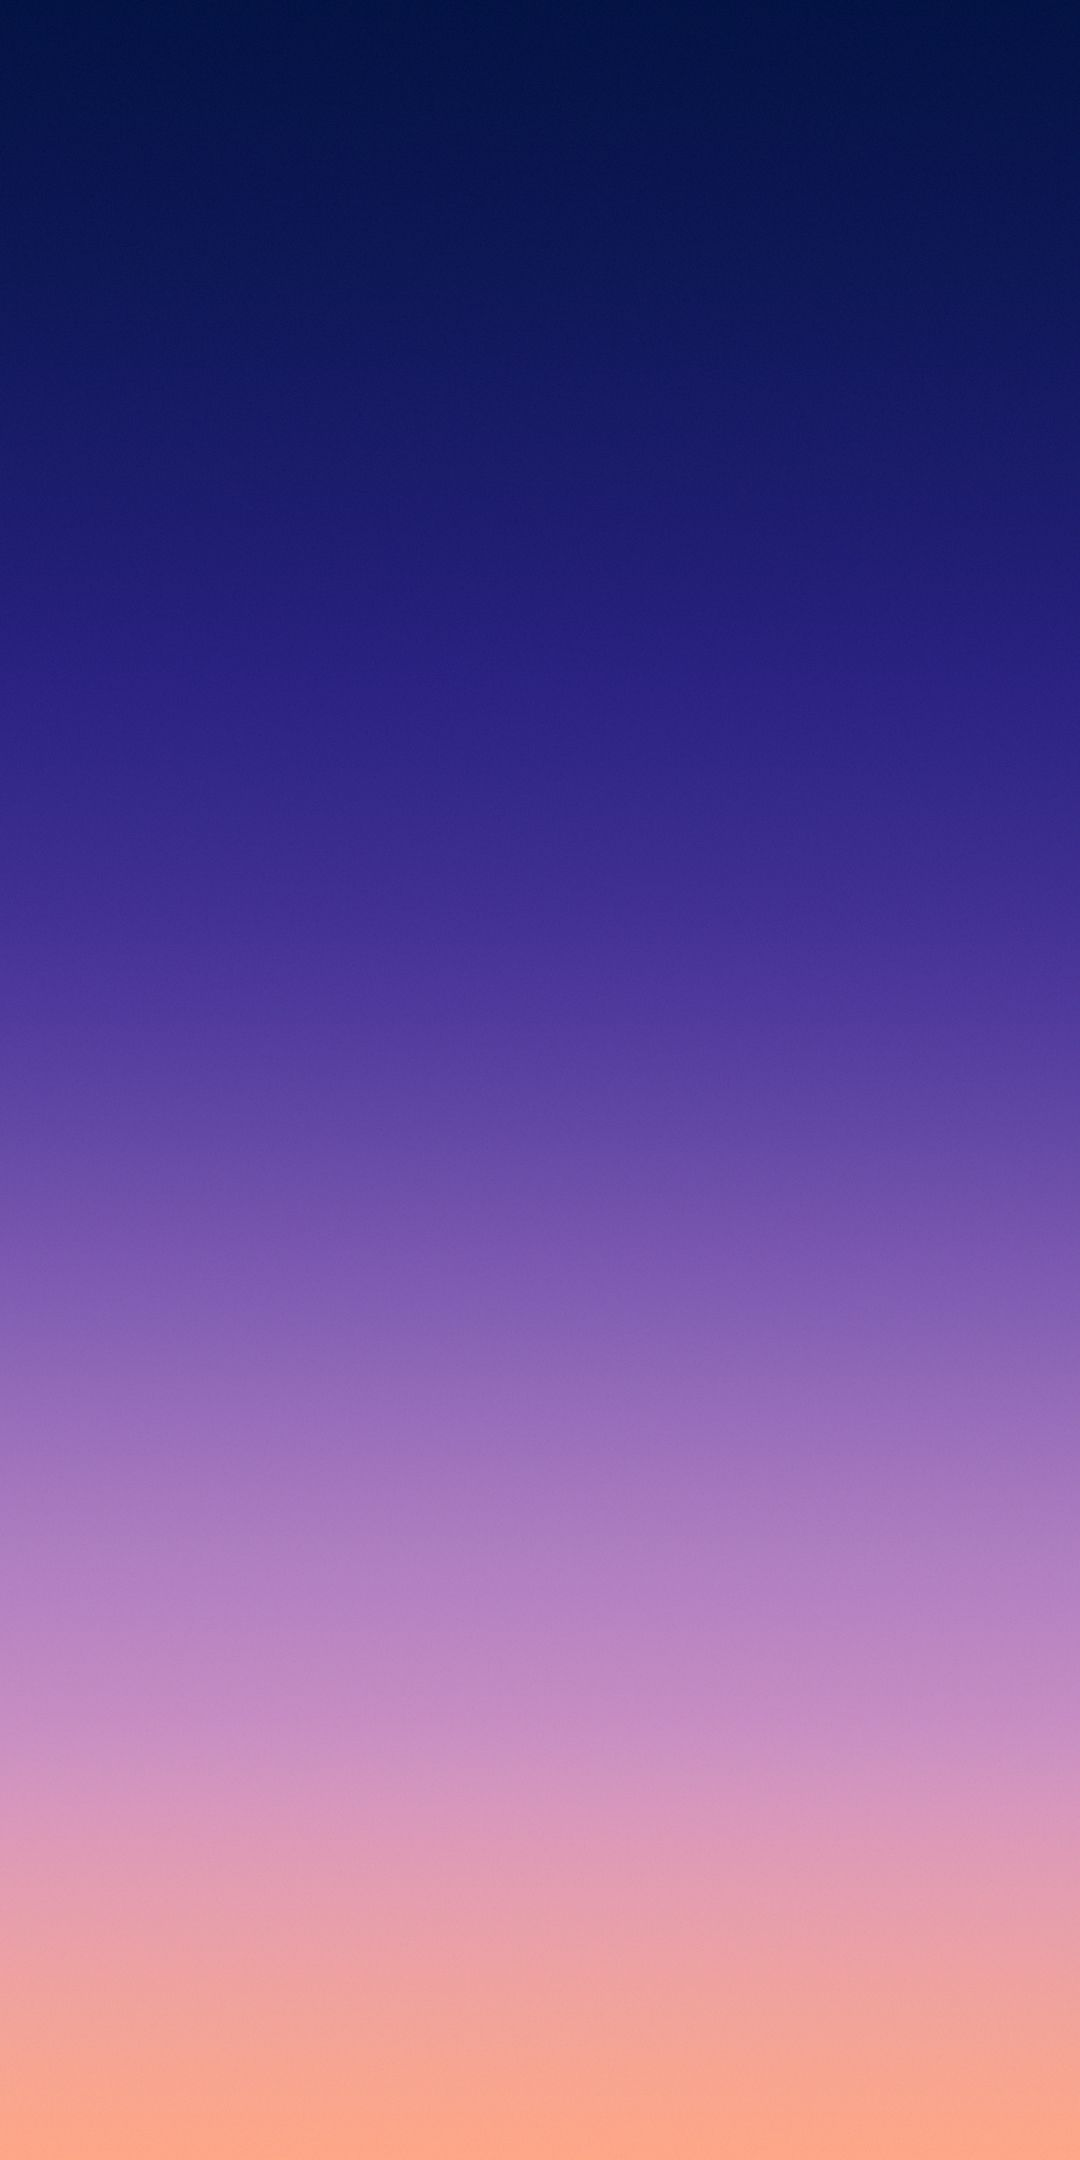 Xiaomi Mi 8 Youth Stock Wallpaper 011 – [1080×2160] 4K